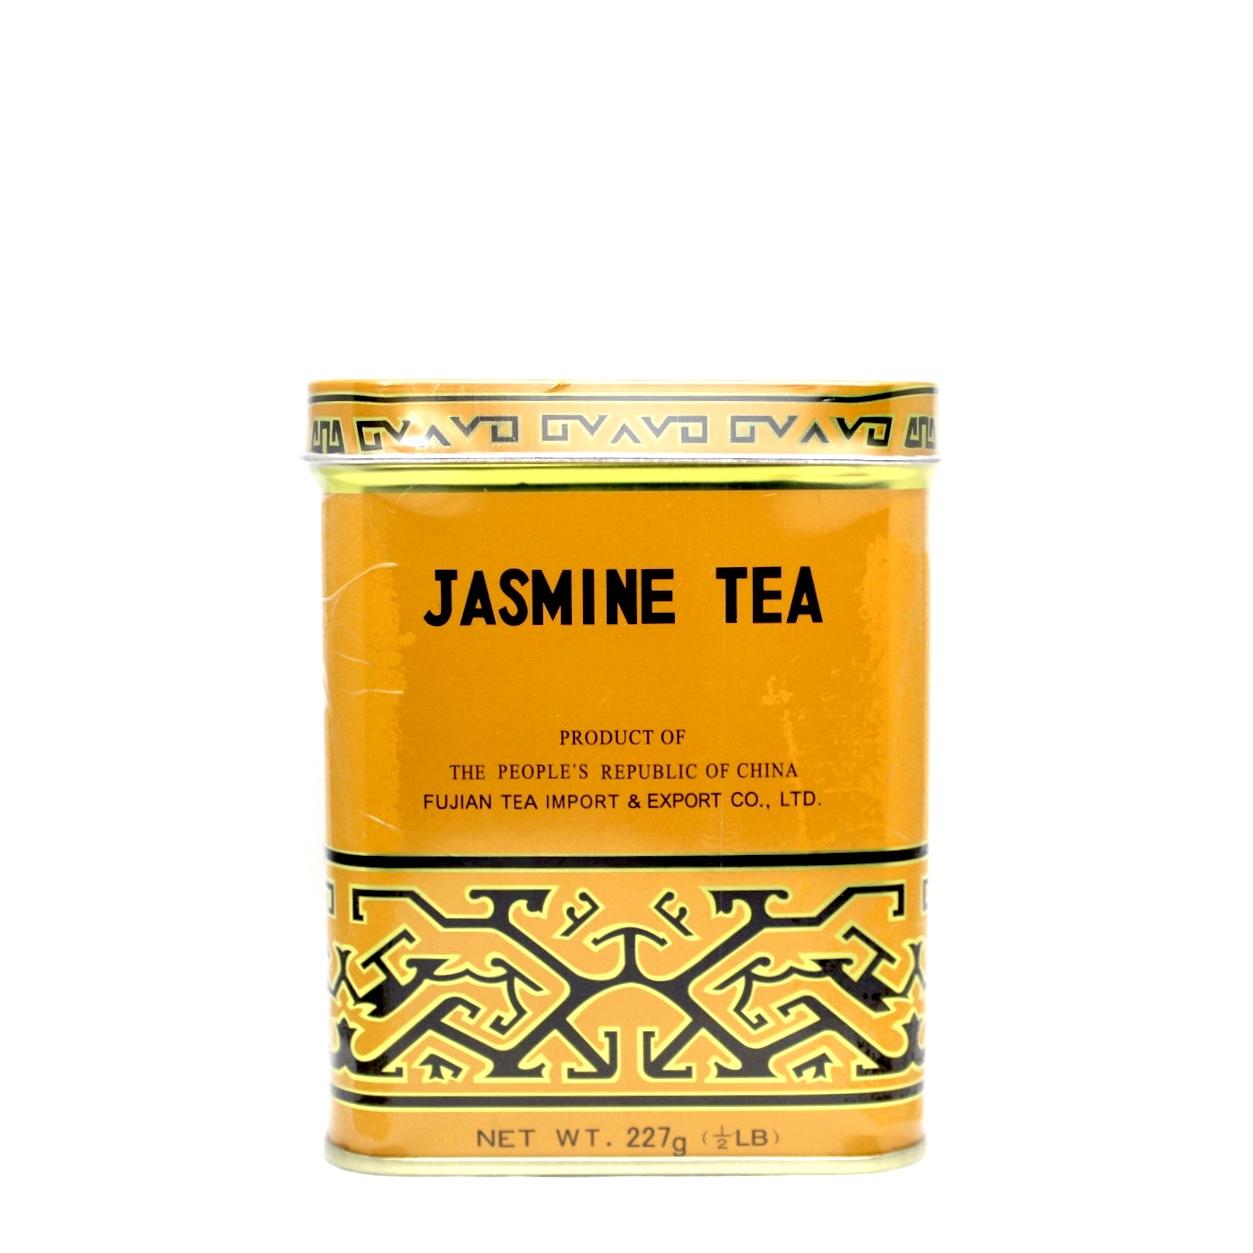 FUJIAN JASMINE TEA 227g LATA 1032